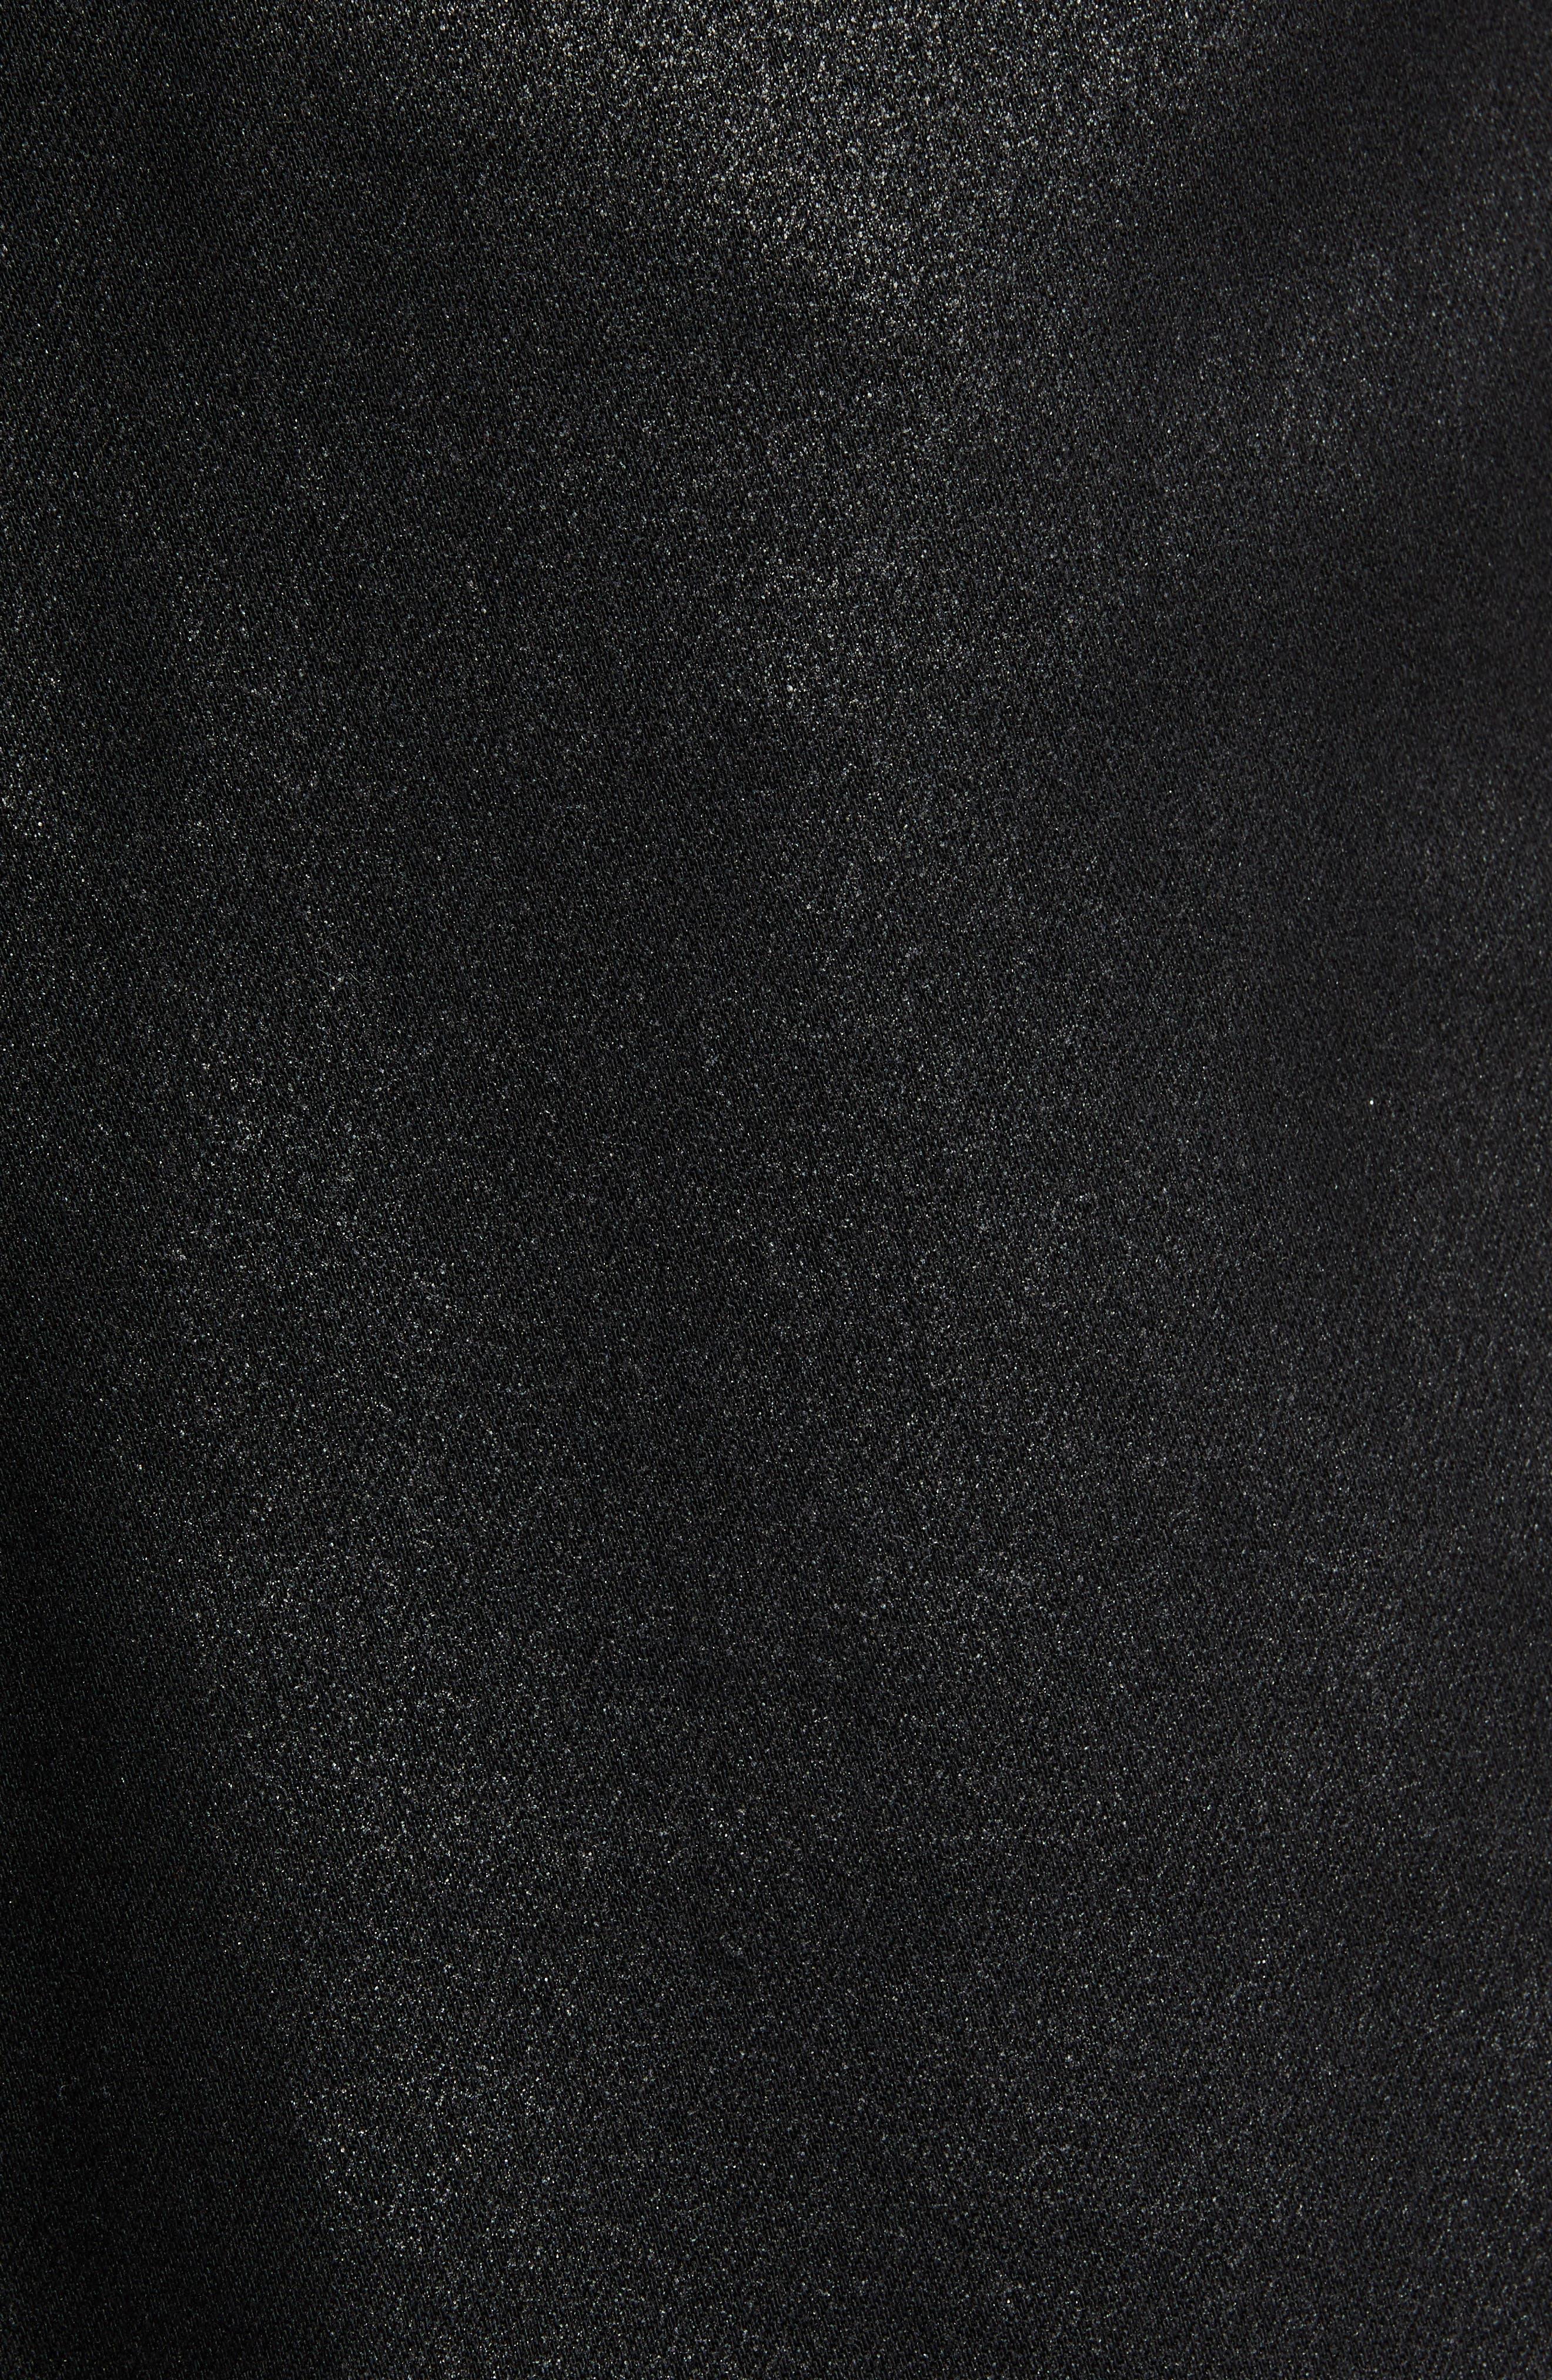 Transcend - Lennox Slim Fit Jeans,                             Alternate thumbnail 5, color,                             WILKS COATED